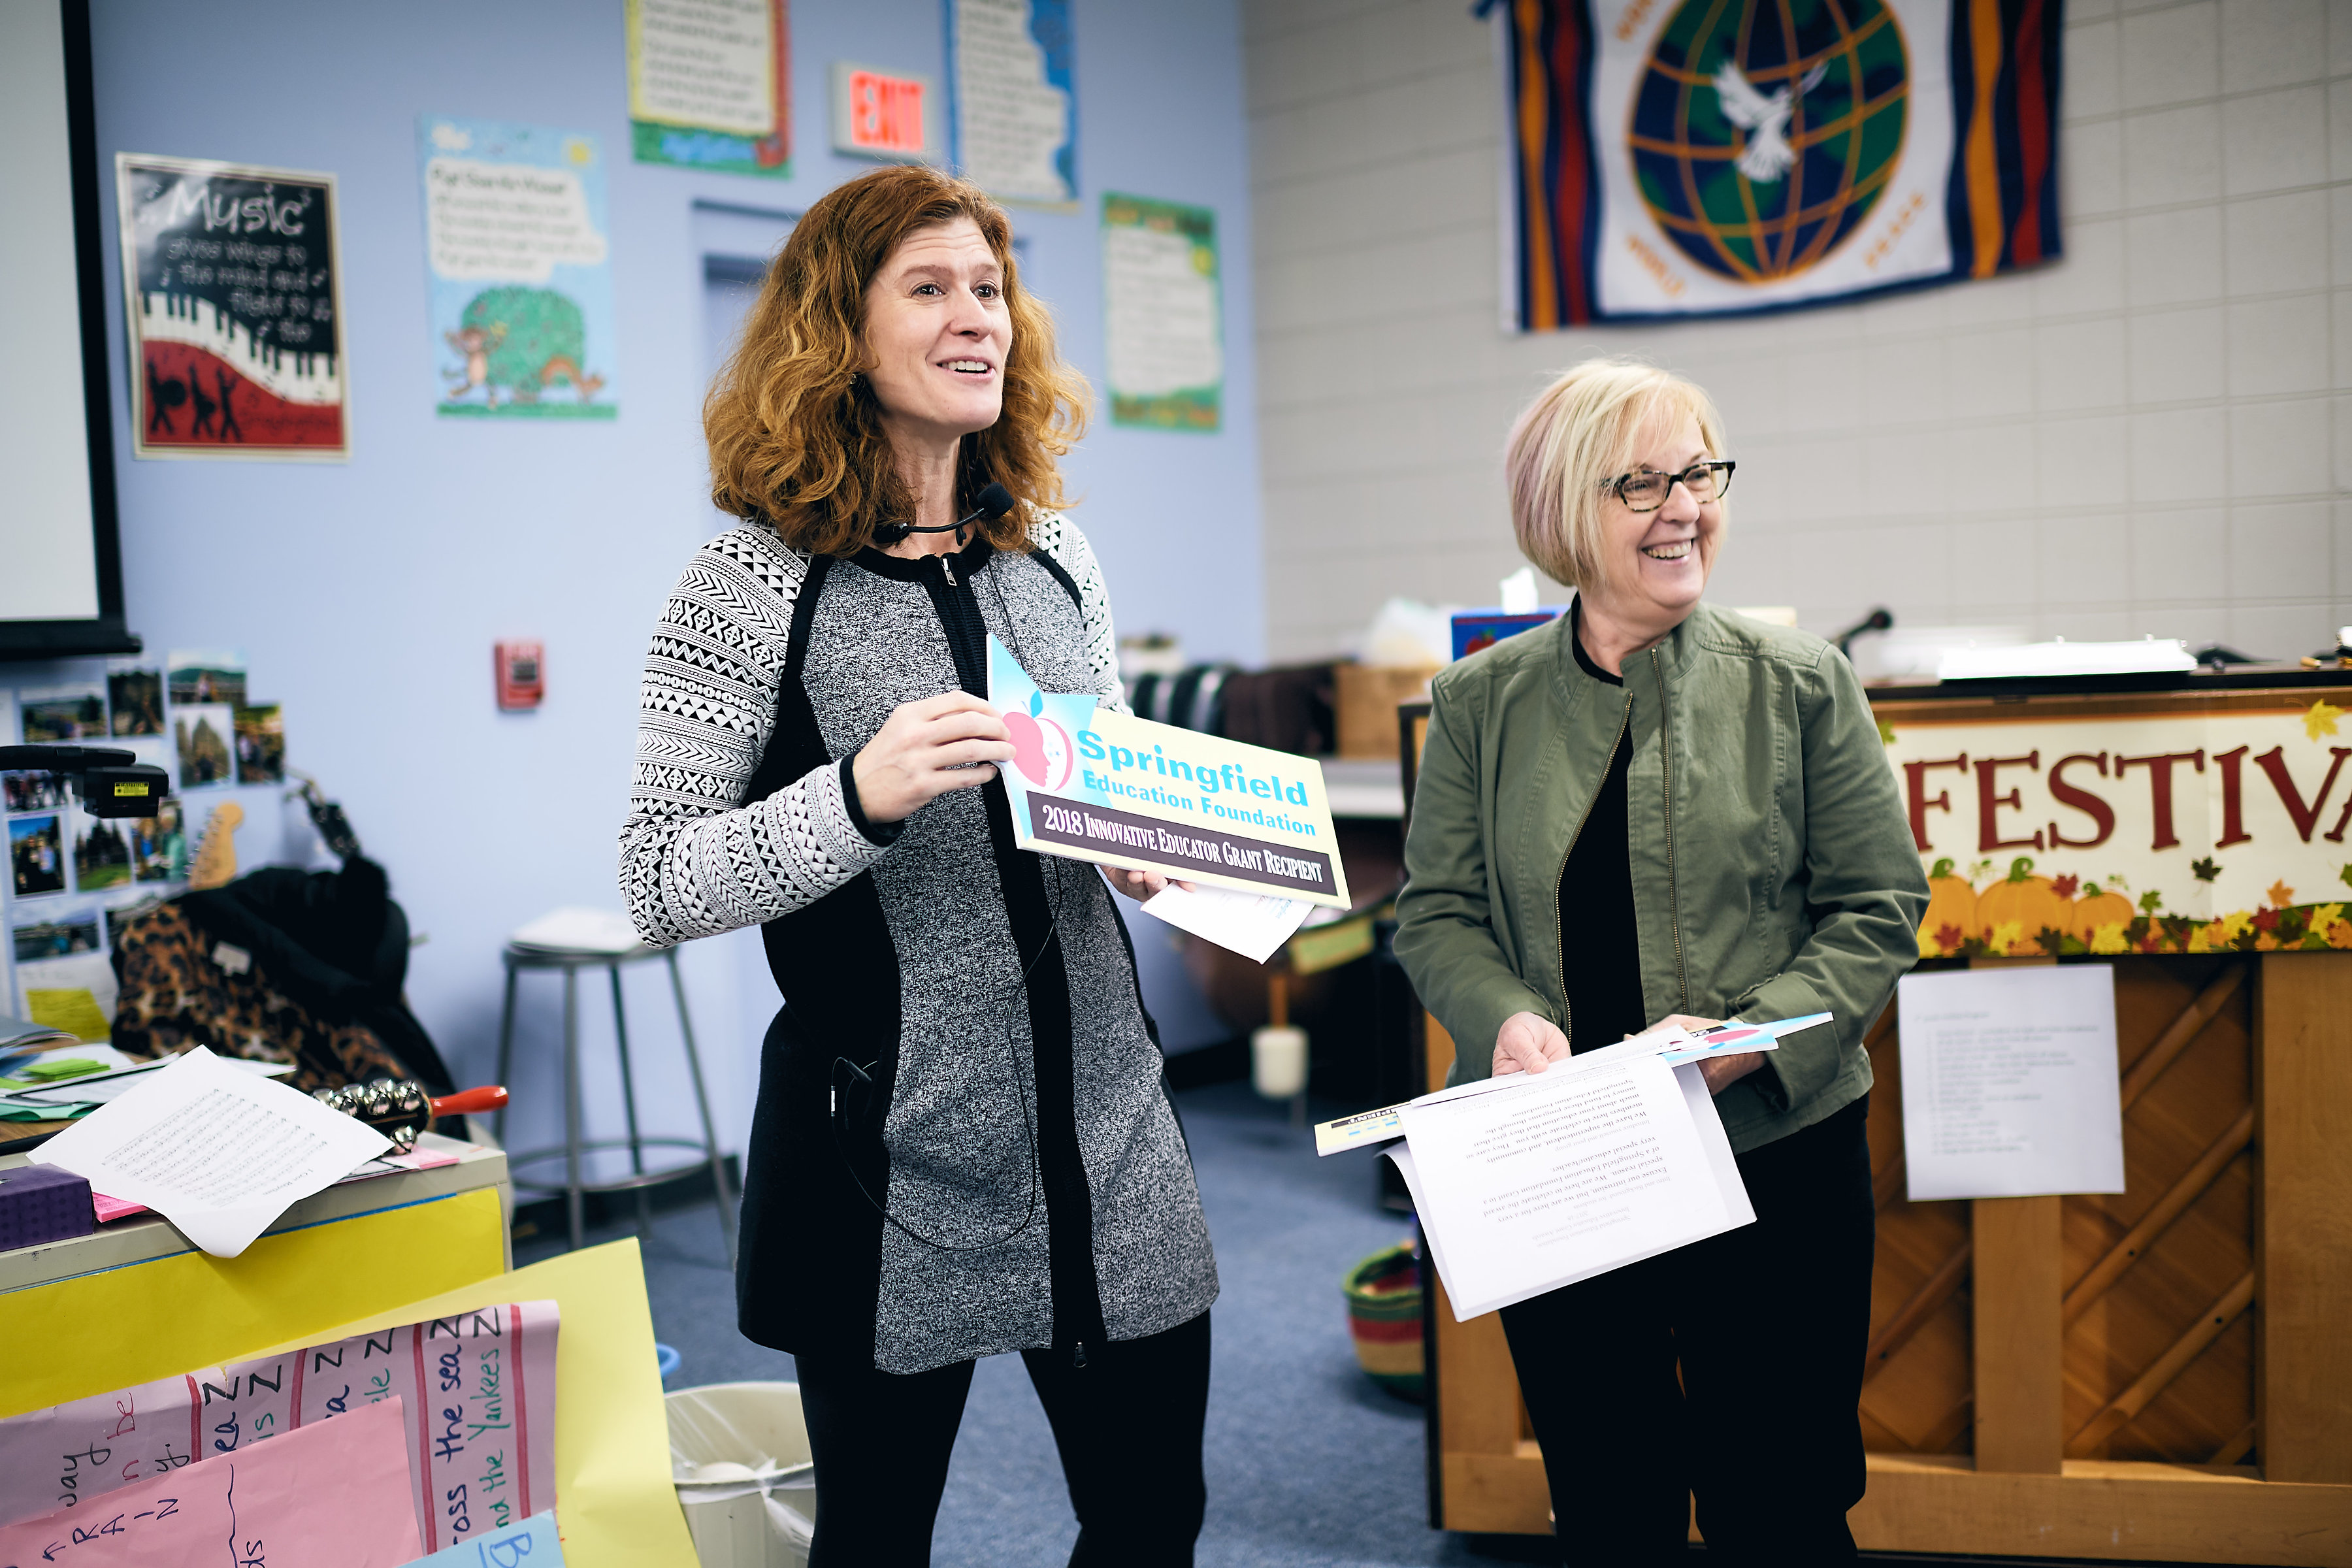 2017-18 Innovative Educator Grant Awards – Springfield